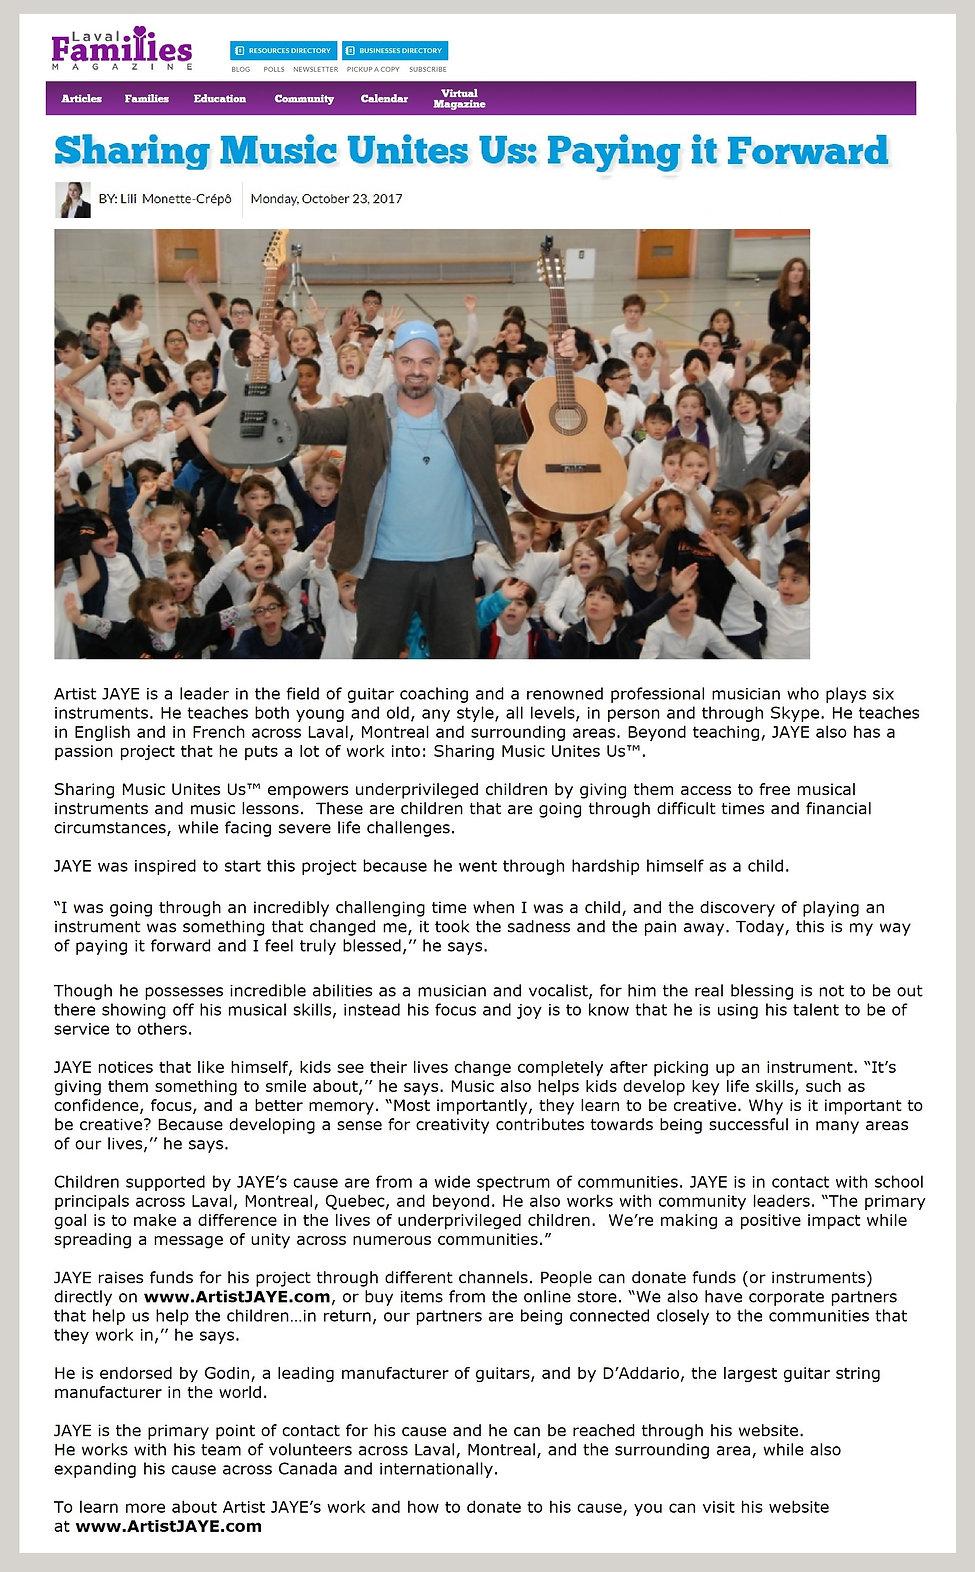 Laval Families Magazine - Artist JAYE's Sharing Music Unites Us™ cause